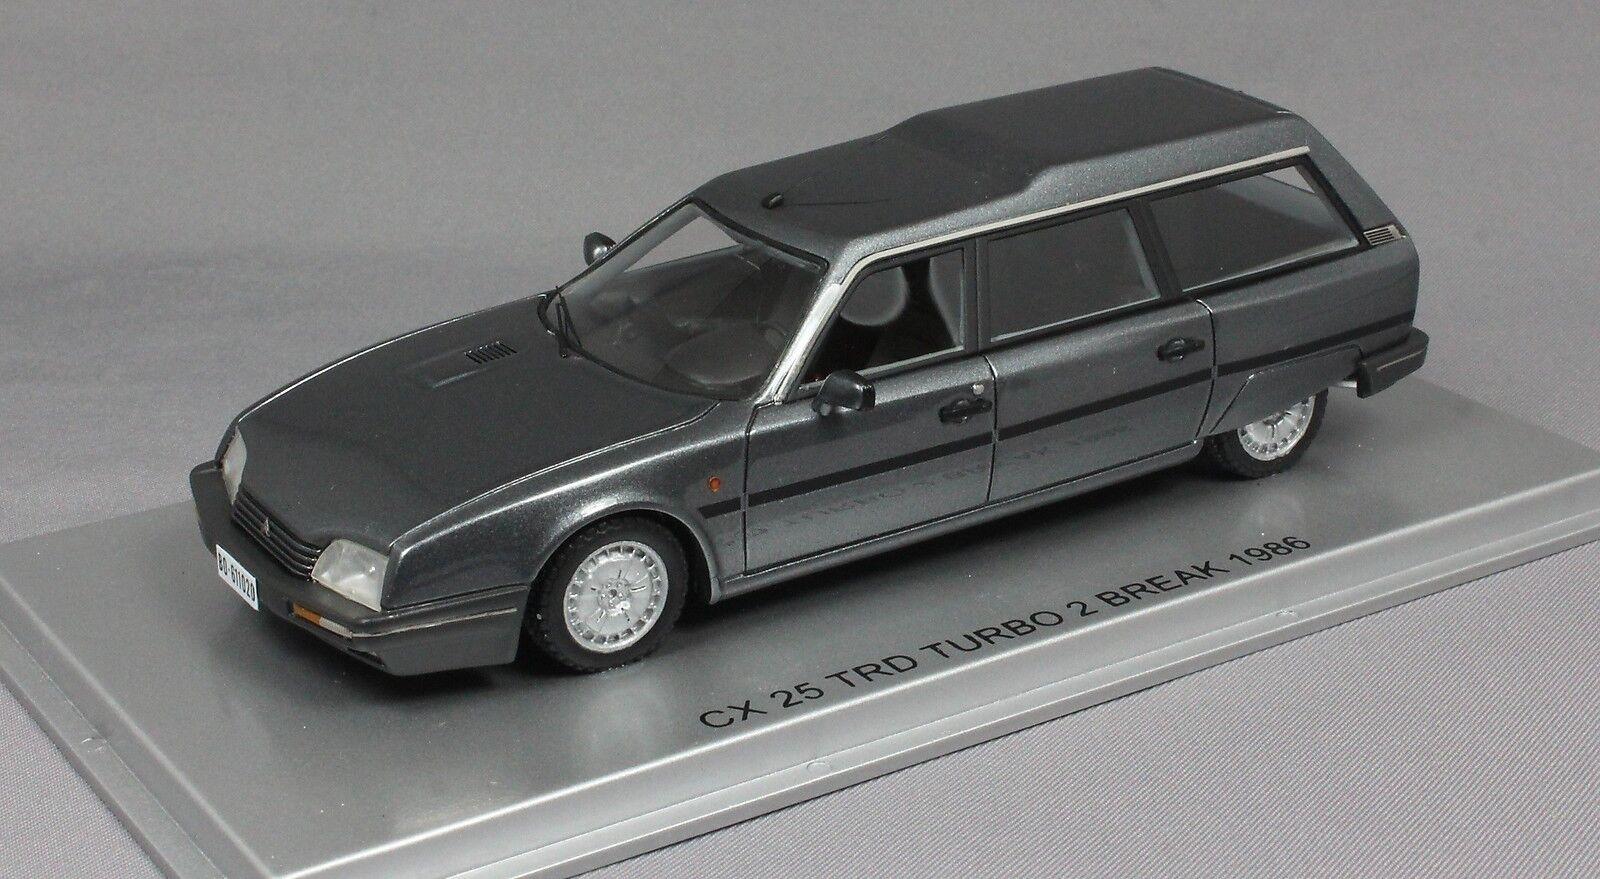 KESS CITROEN CX 25 TRD Turbo Estate in gris Met 1986 KE43011020 Ltded 300 1 43 Nouveau